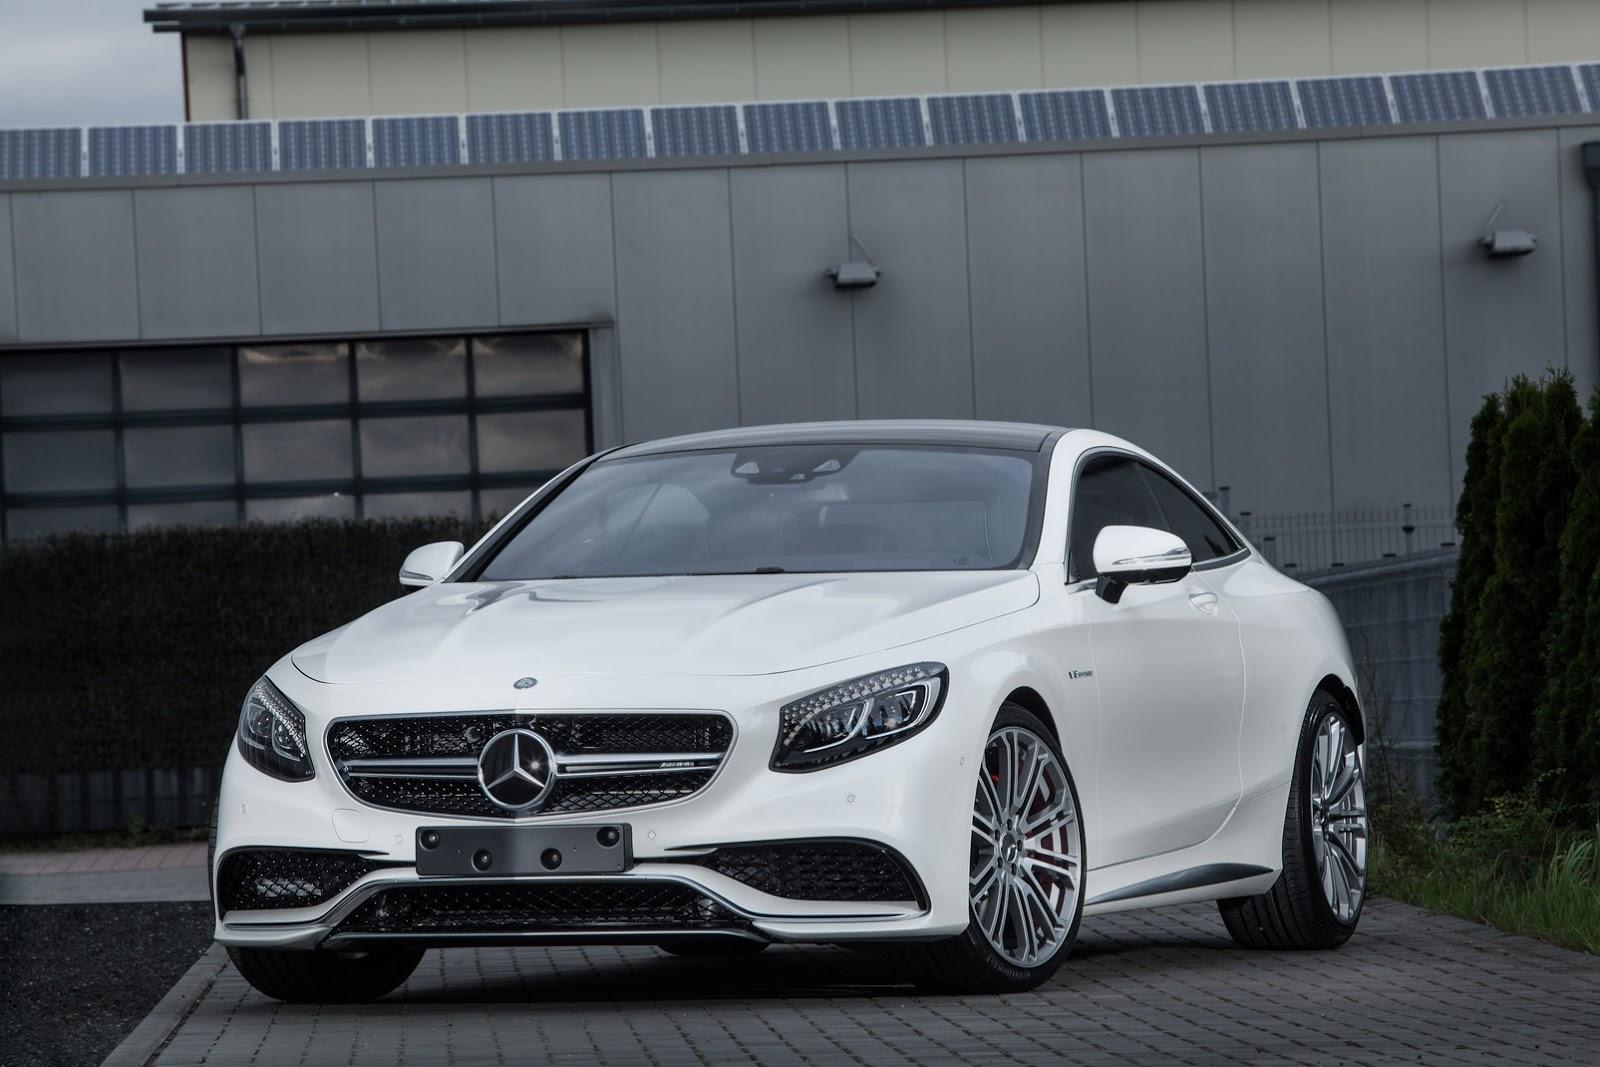 http://2.bp.blogspot.com/-nKZMnnsOAnY/VGpDi8x9fbI/AAAAAAAAZjM/WJWNNamtJe8/s1600/IMSA-Mercedes-S63-AMG-Coupe8.jpg